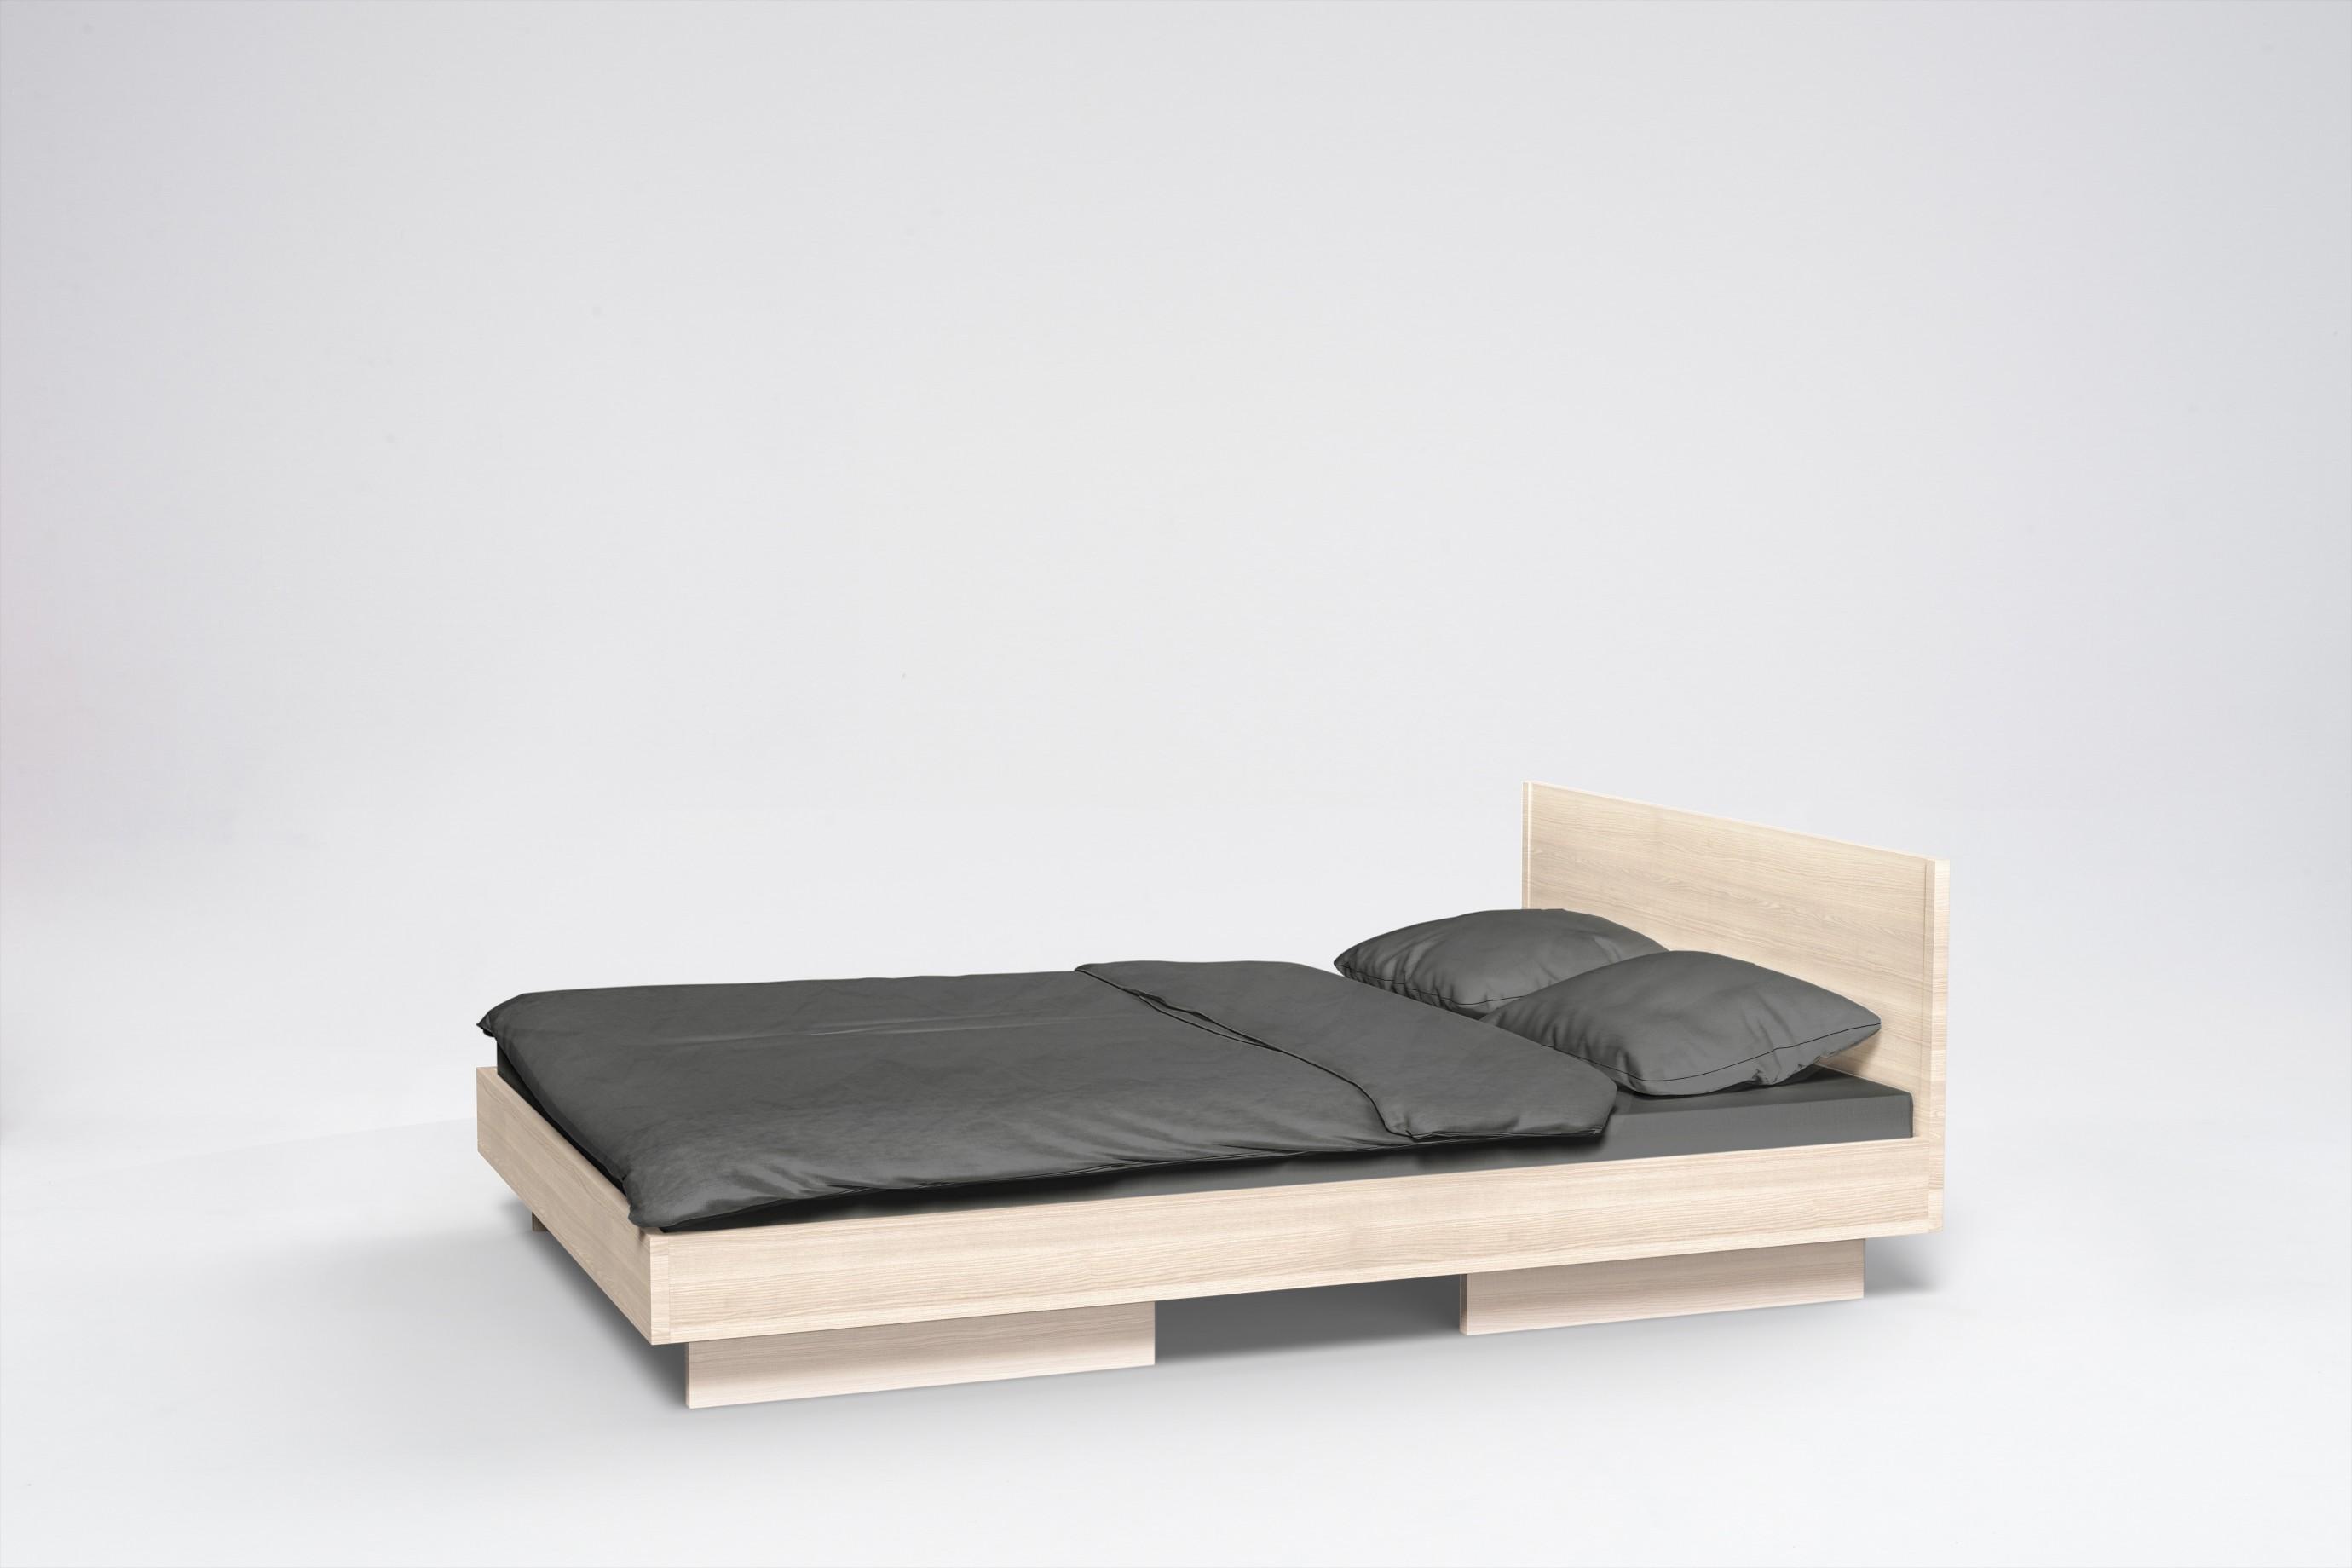 Zians Bed Medium by Jacques Zians Victors Design Agency